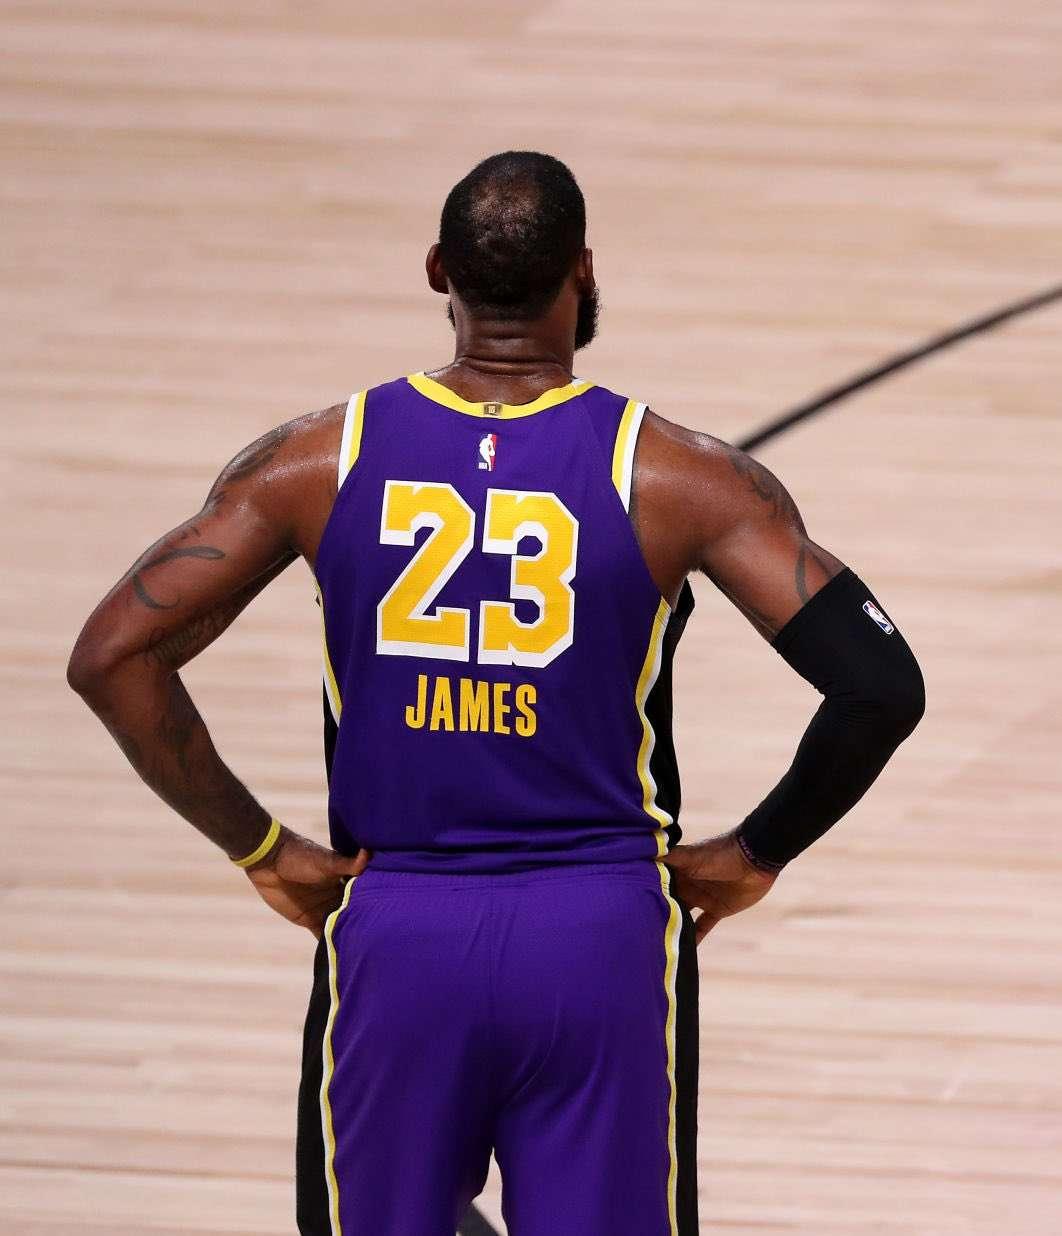 csgo下注詹姆斯过去7轮系列赛G1输掉6场,但前6轮赢下4次_csgo下注NBA新闻